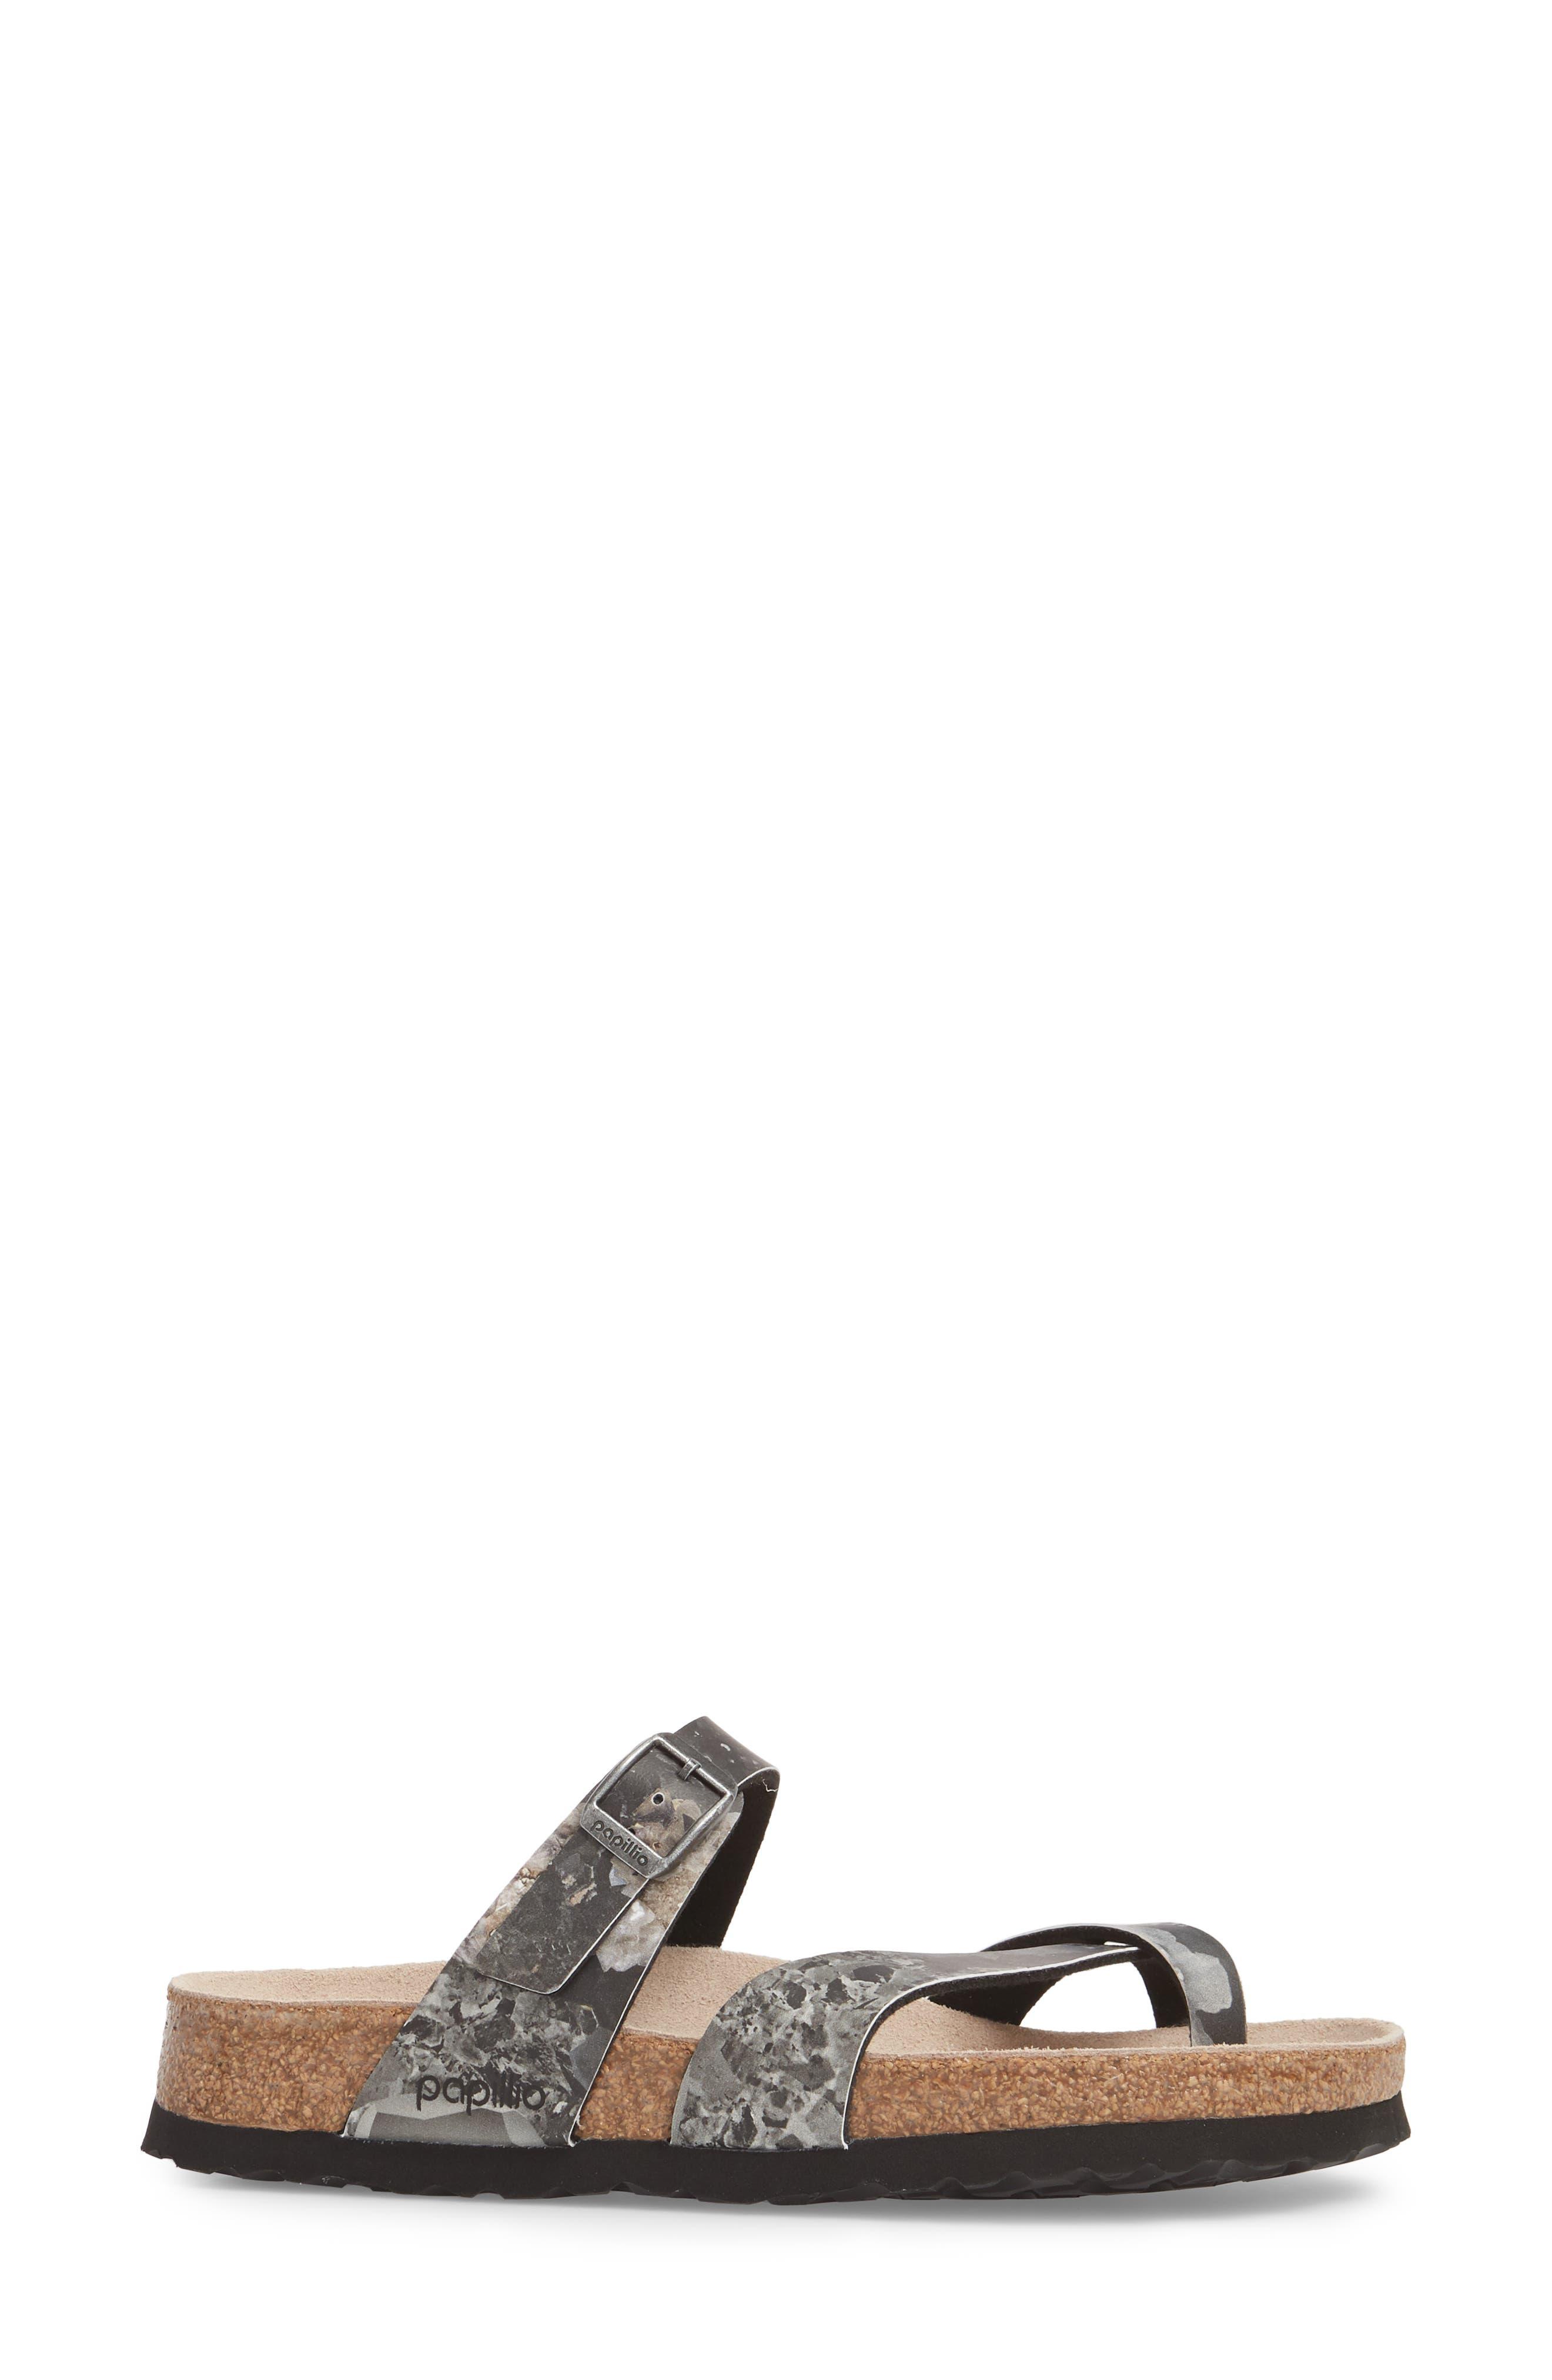 Papillio by Birkenstock Tabora Birko-Flor Slide Sandal,                             Alternate thumbnail 3, color,                             Crystal Black Leather